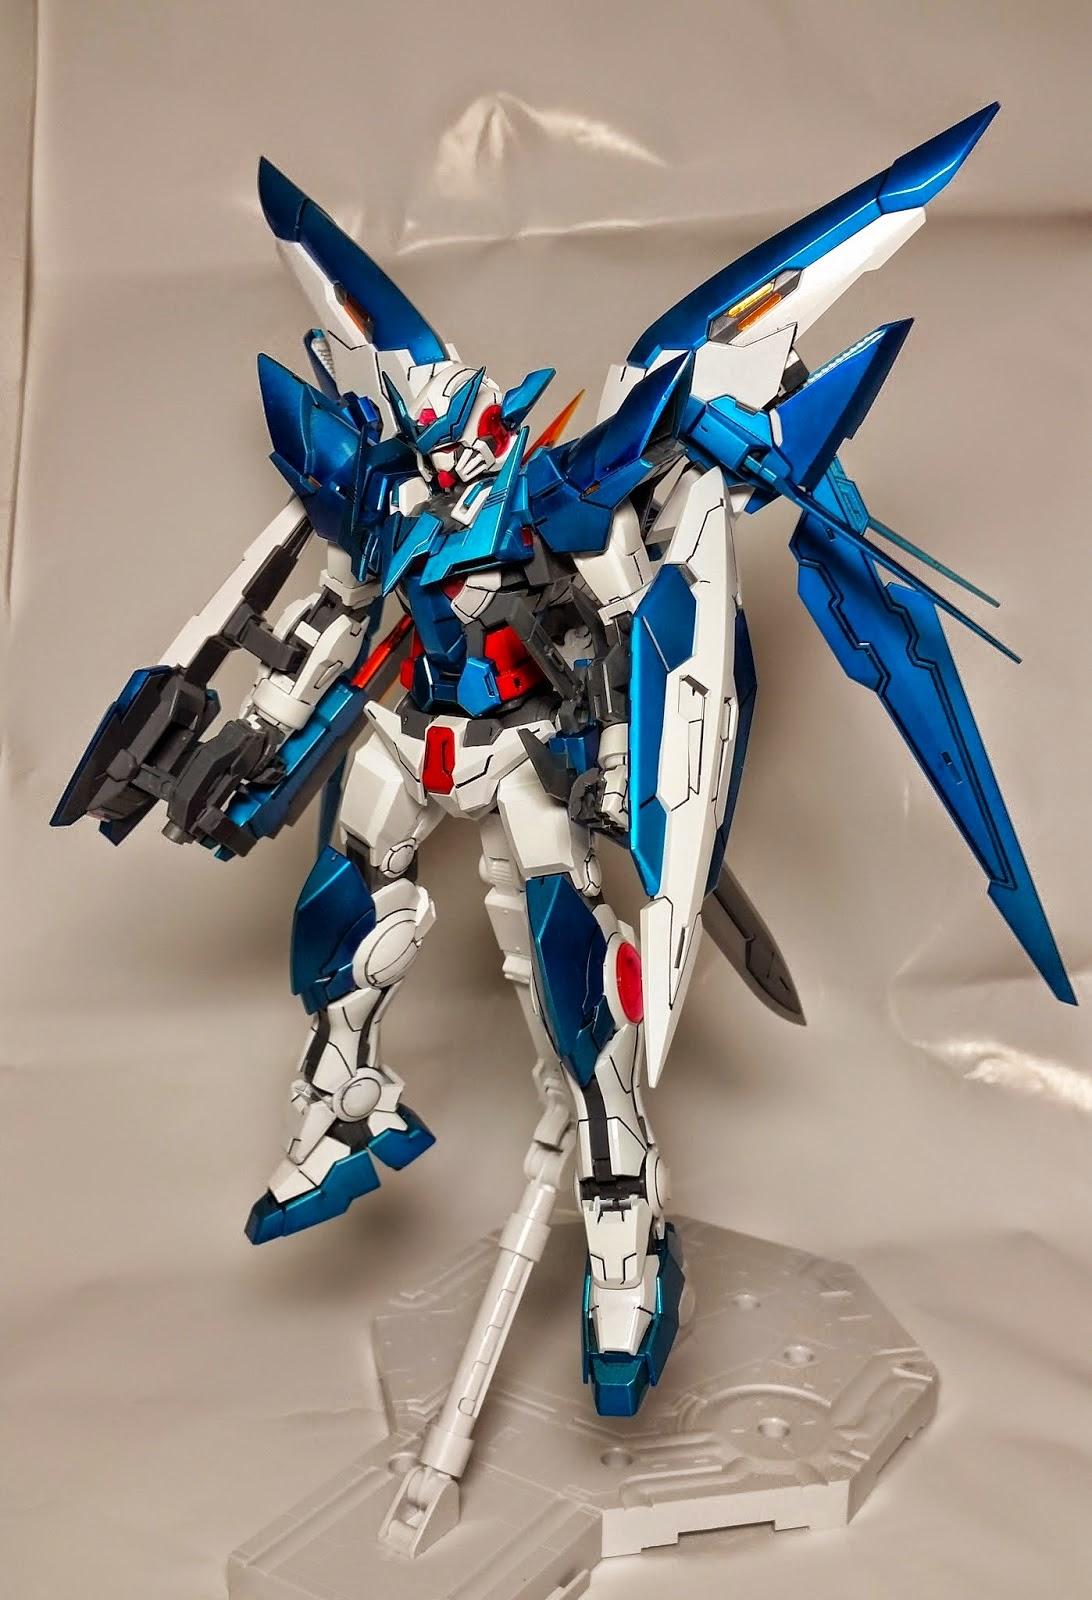 GN-001REIII Gundam Exia Repair III | The Gundam Wiki ...  |Gundam Exia